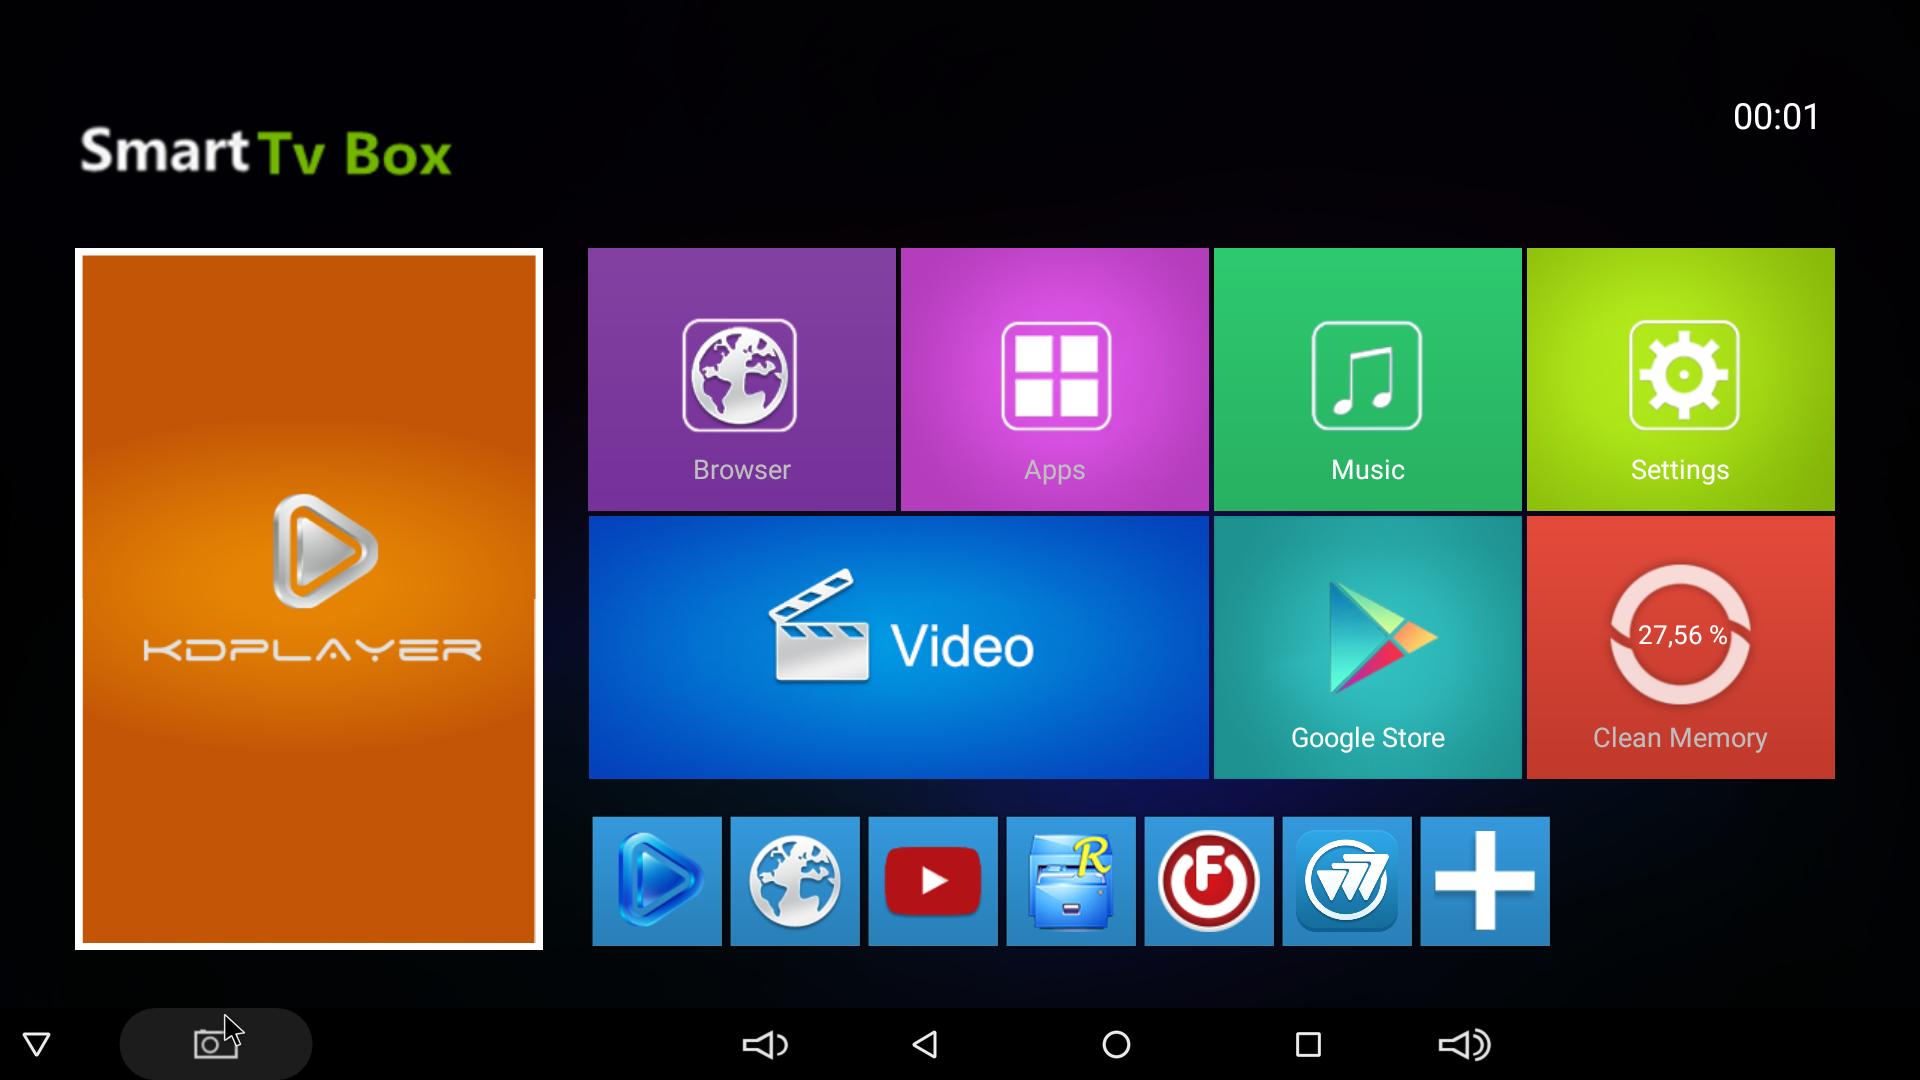 Screenshot_рабочего_стола_приставки_Alfacore_Smart_TV_Xplaeyr.png